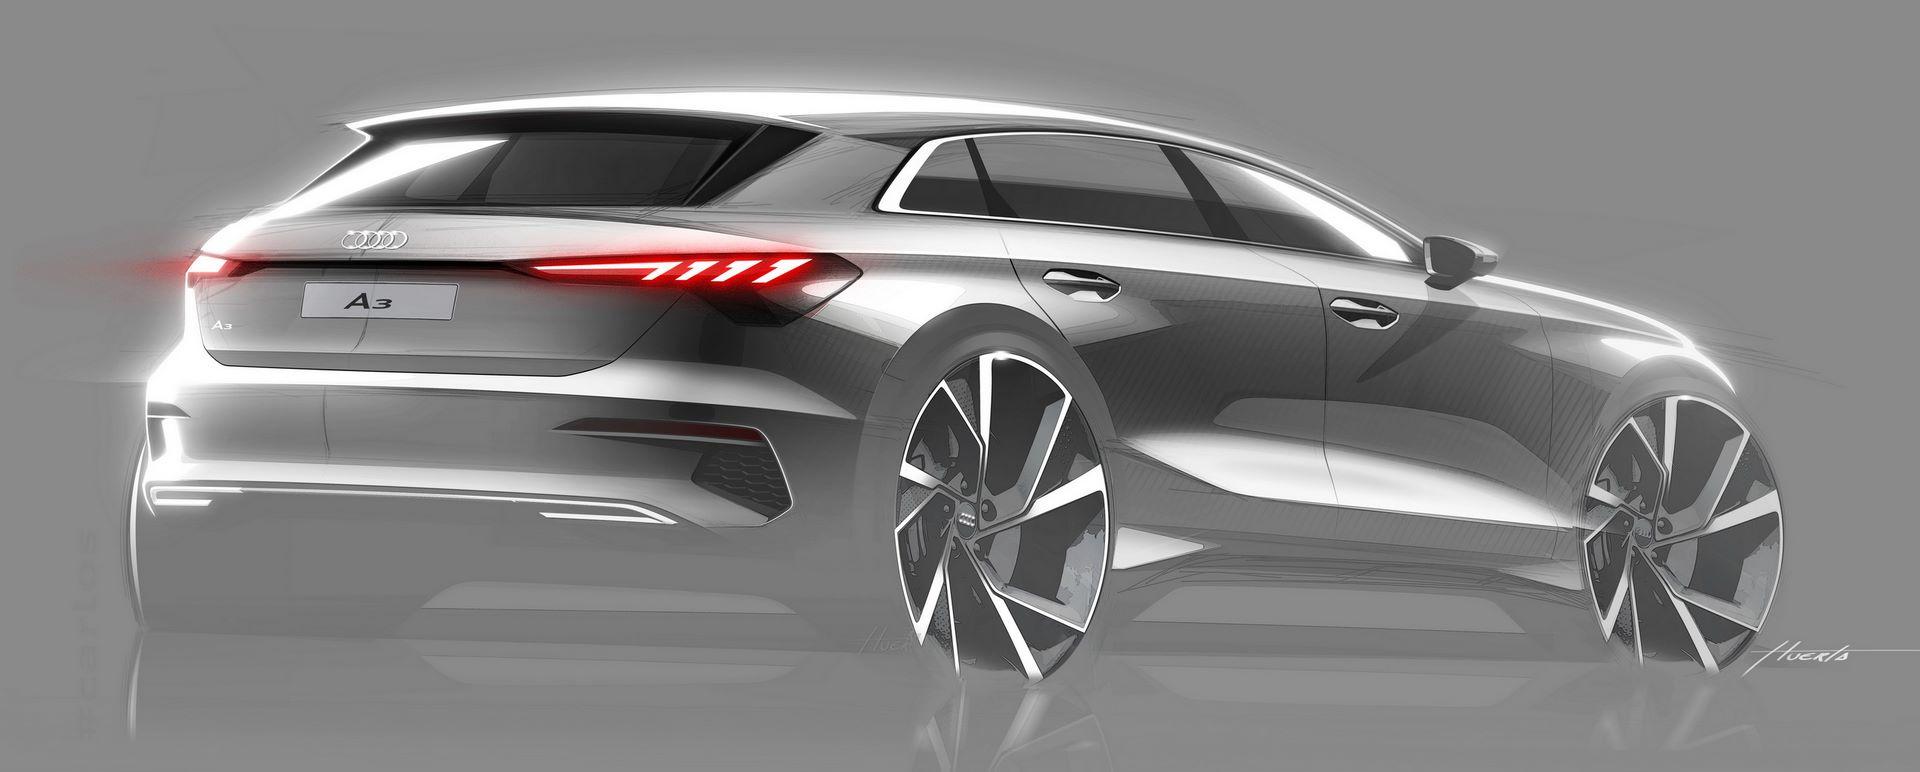 Audi-A3-Sportback-2020-19